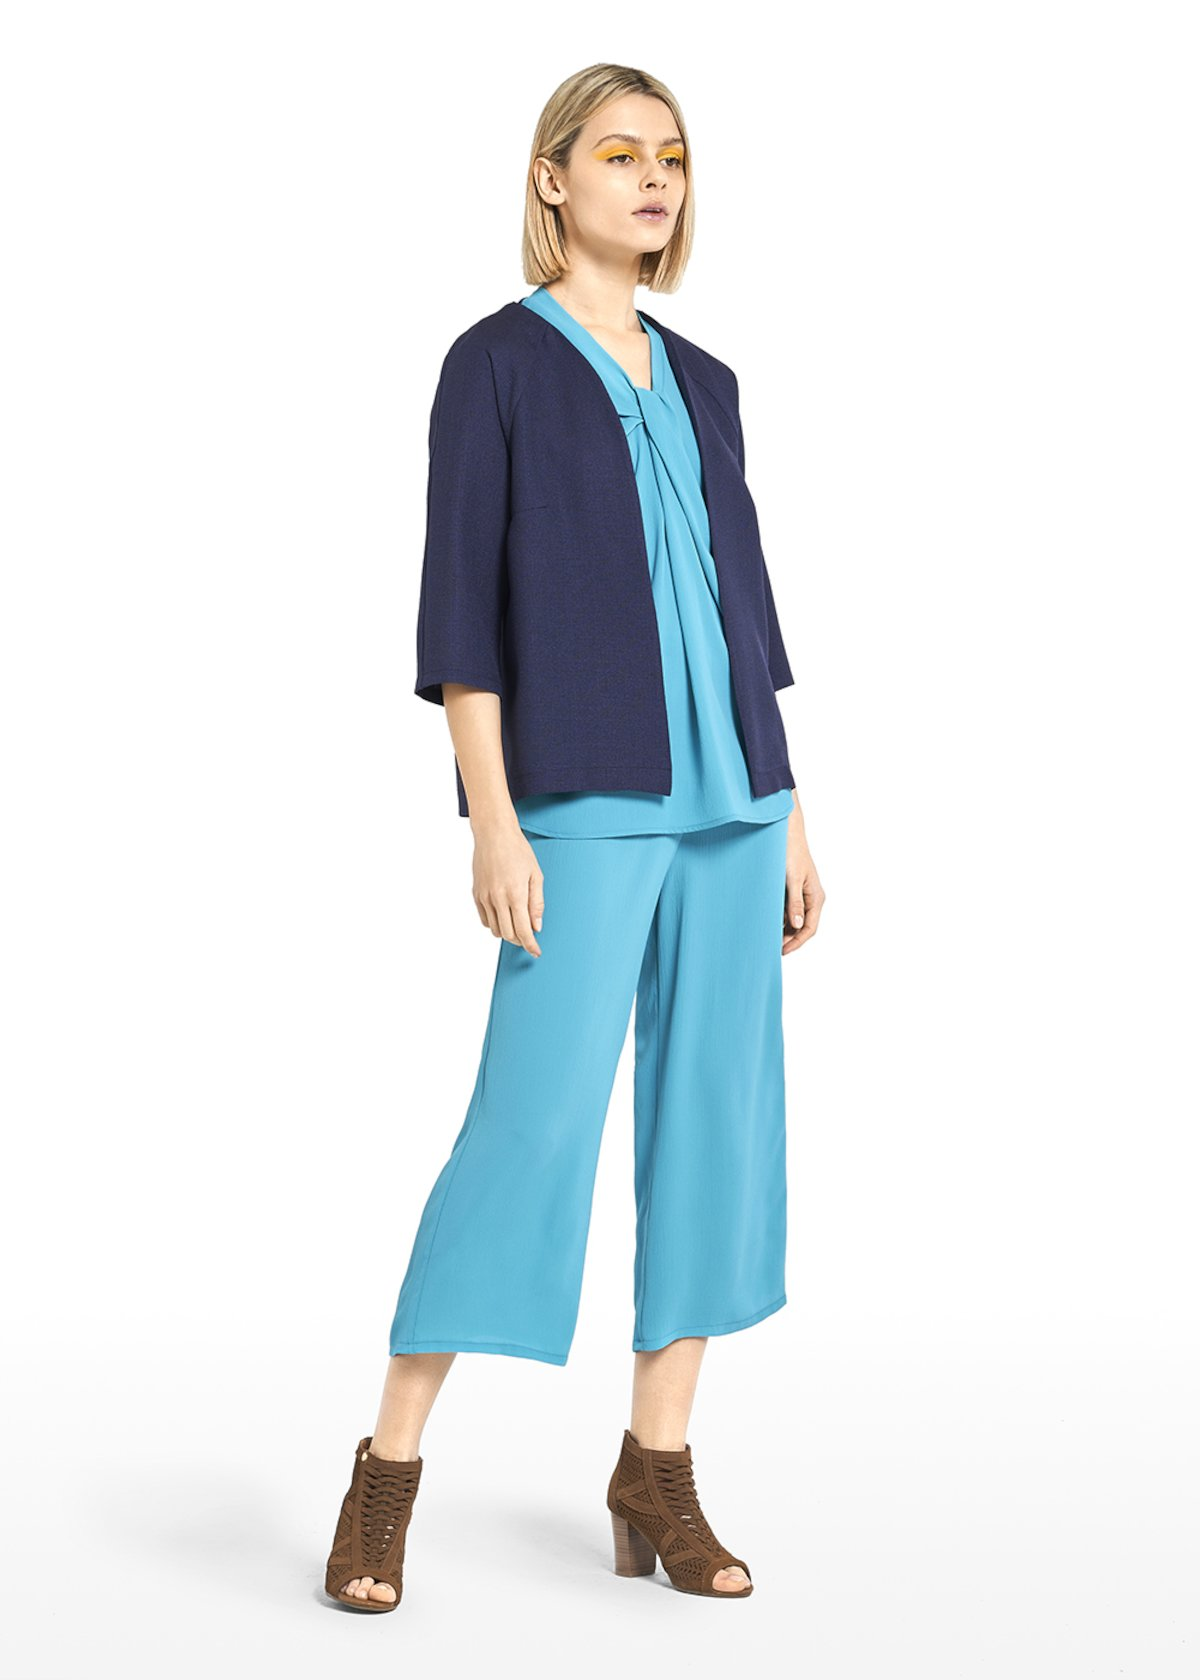 Cesar Mat shrug - Medium Blue - Woman - Category image